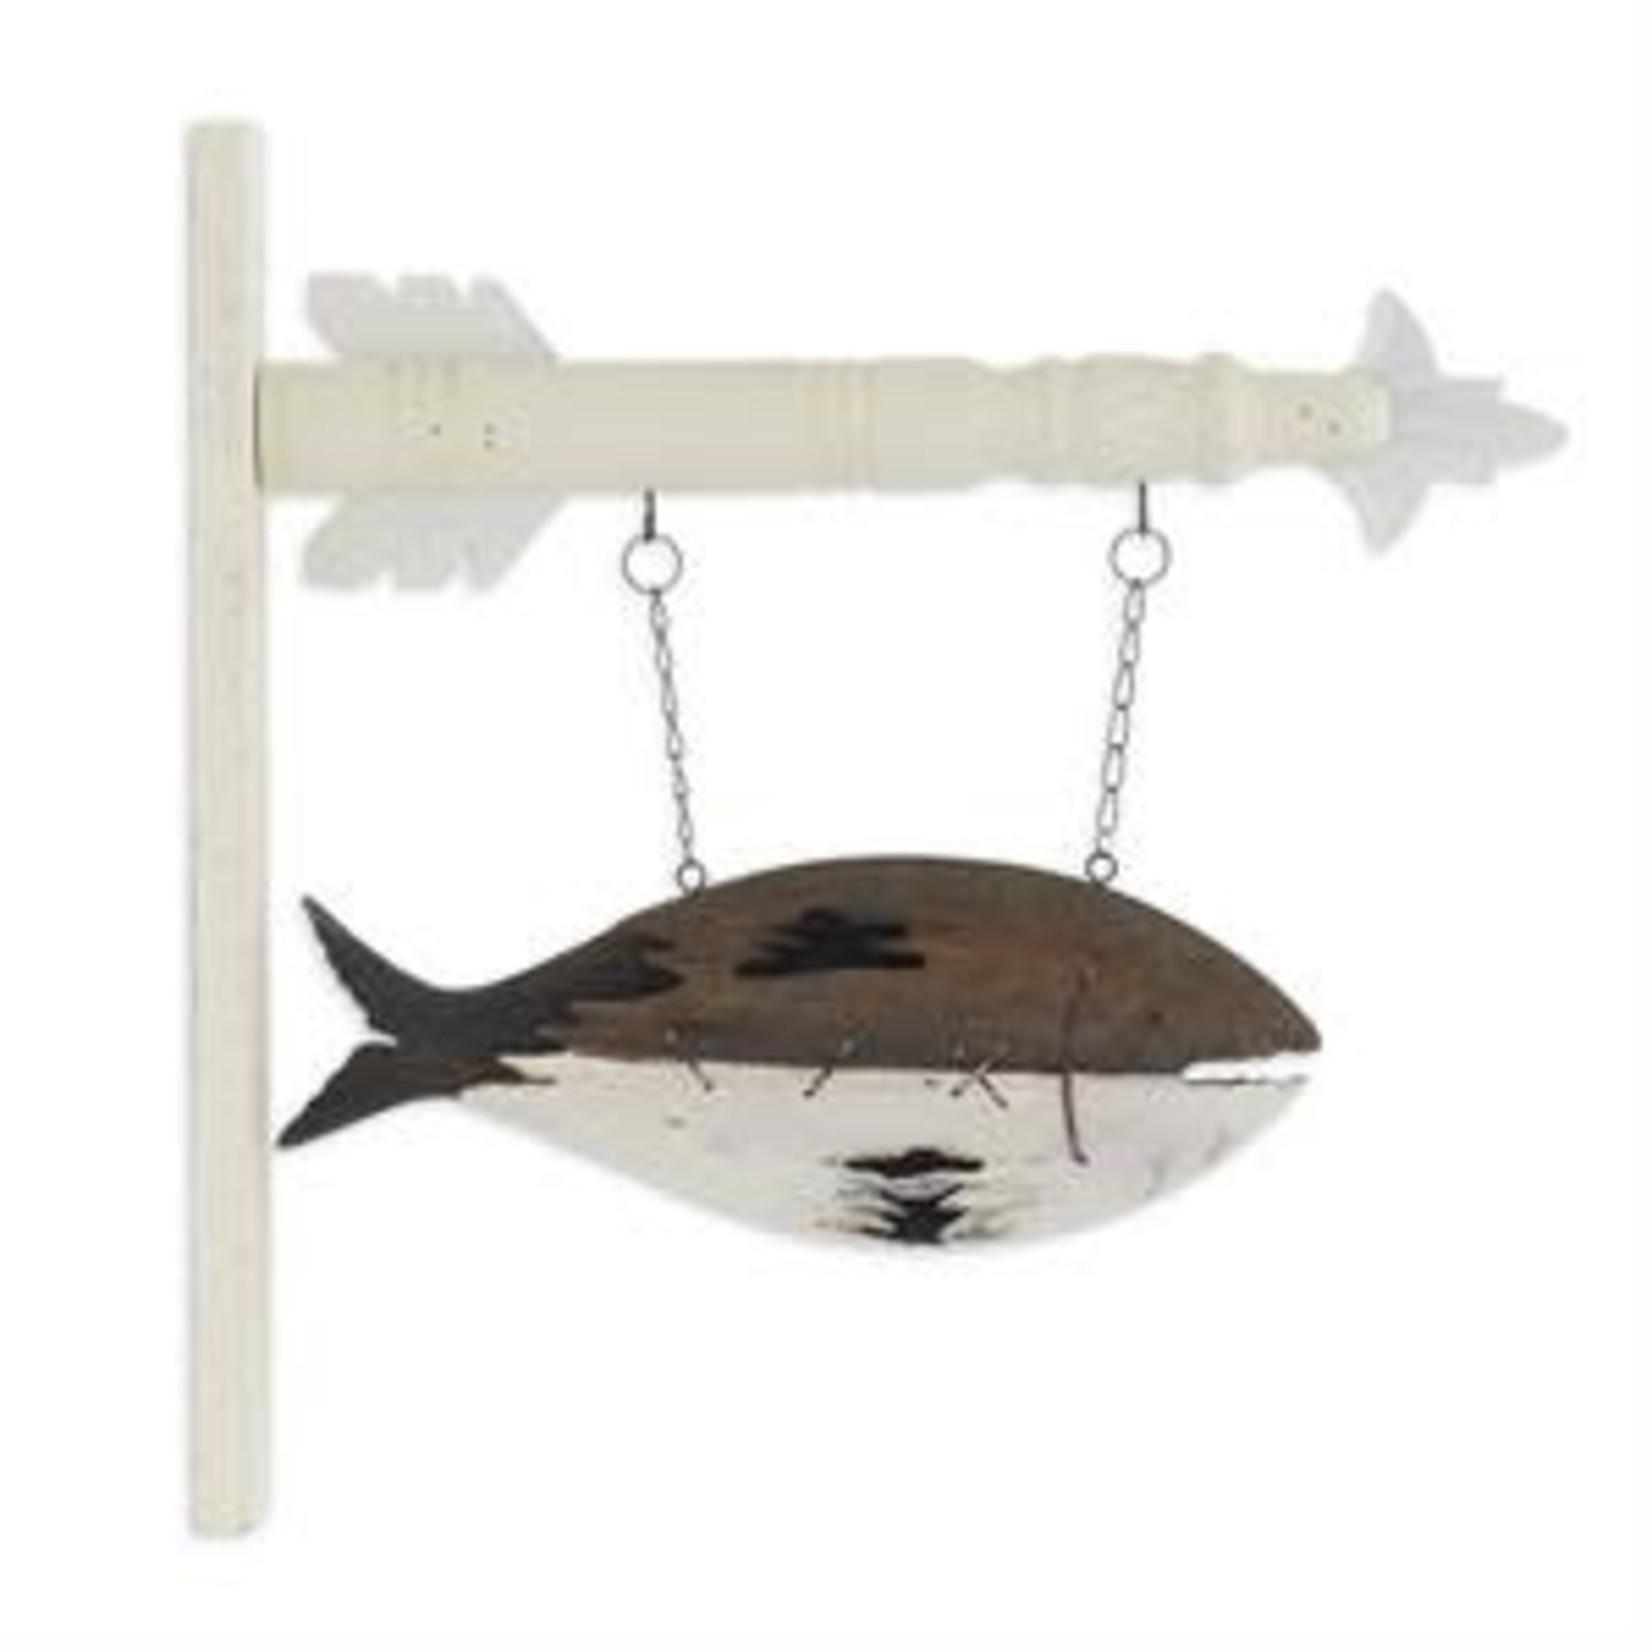 "13"" BRWN/WHT WOOD FISH ARROW"